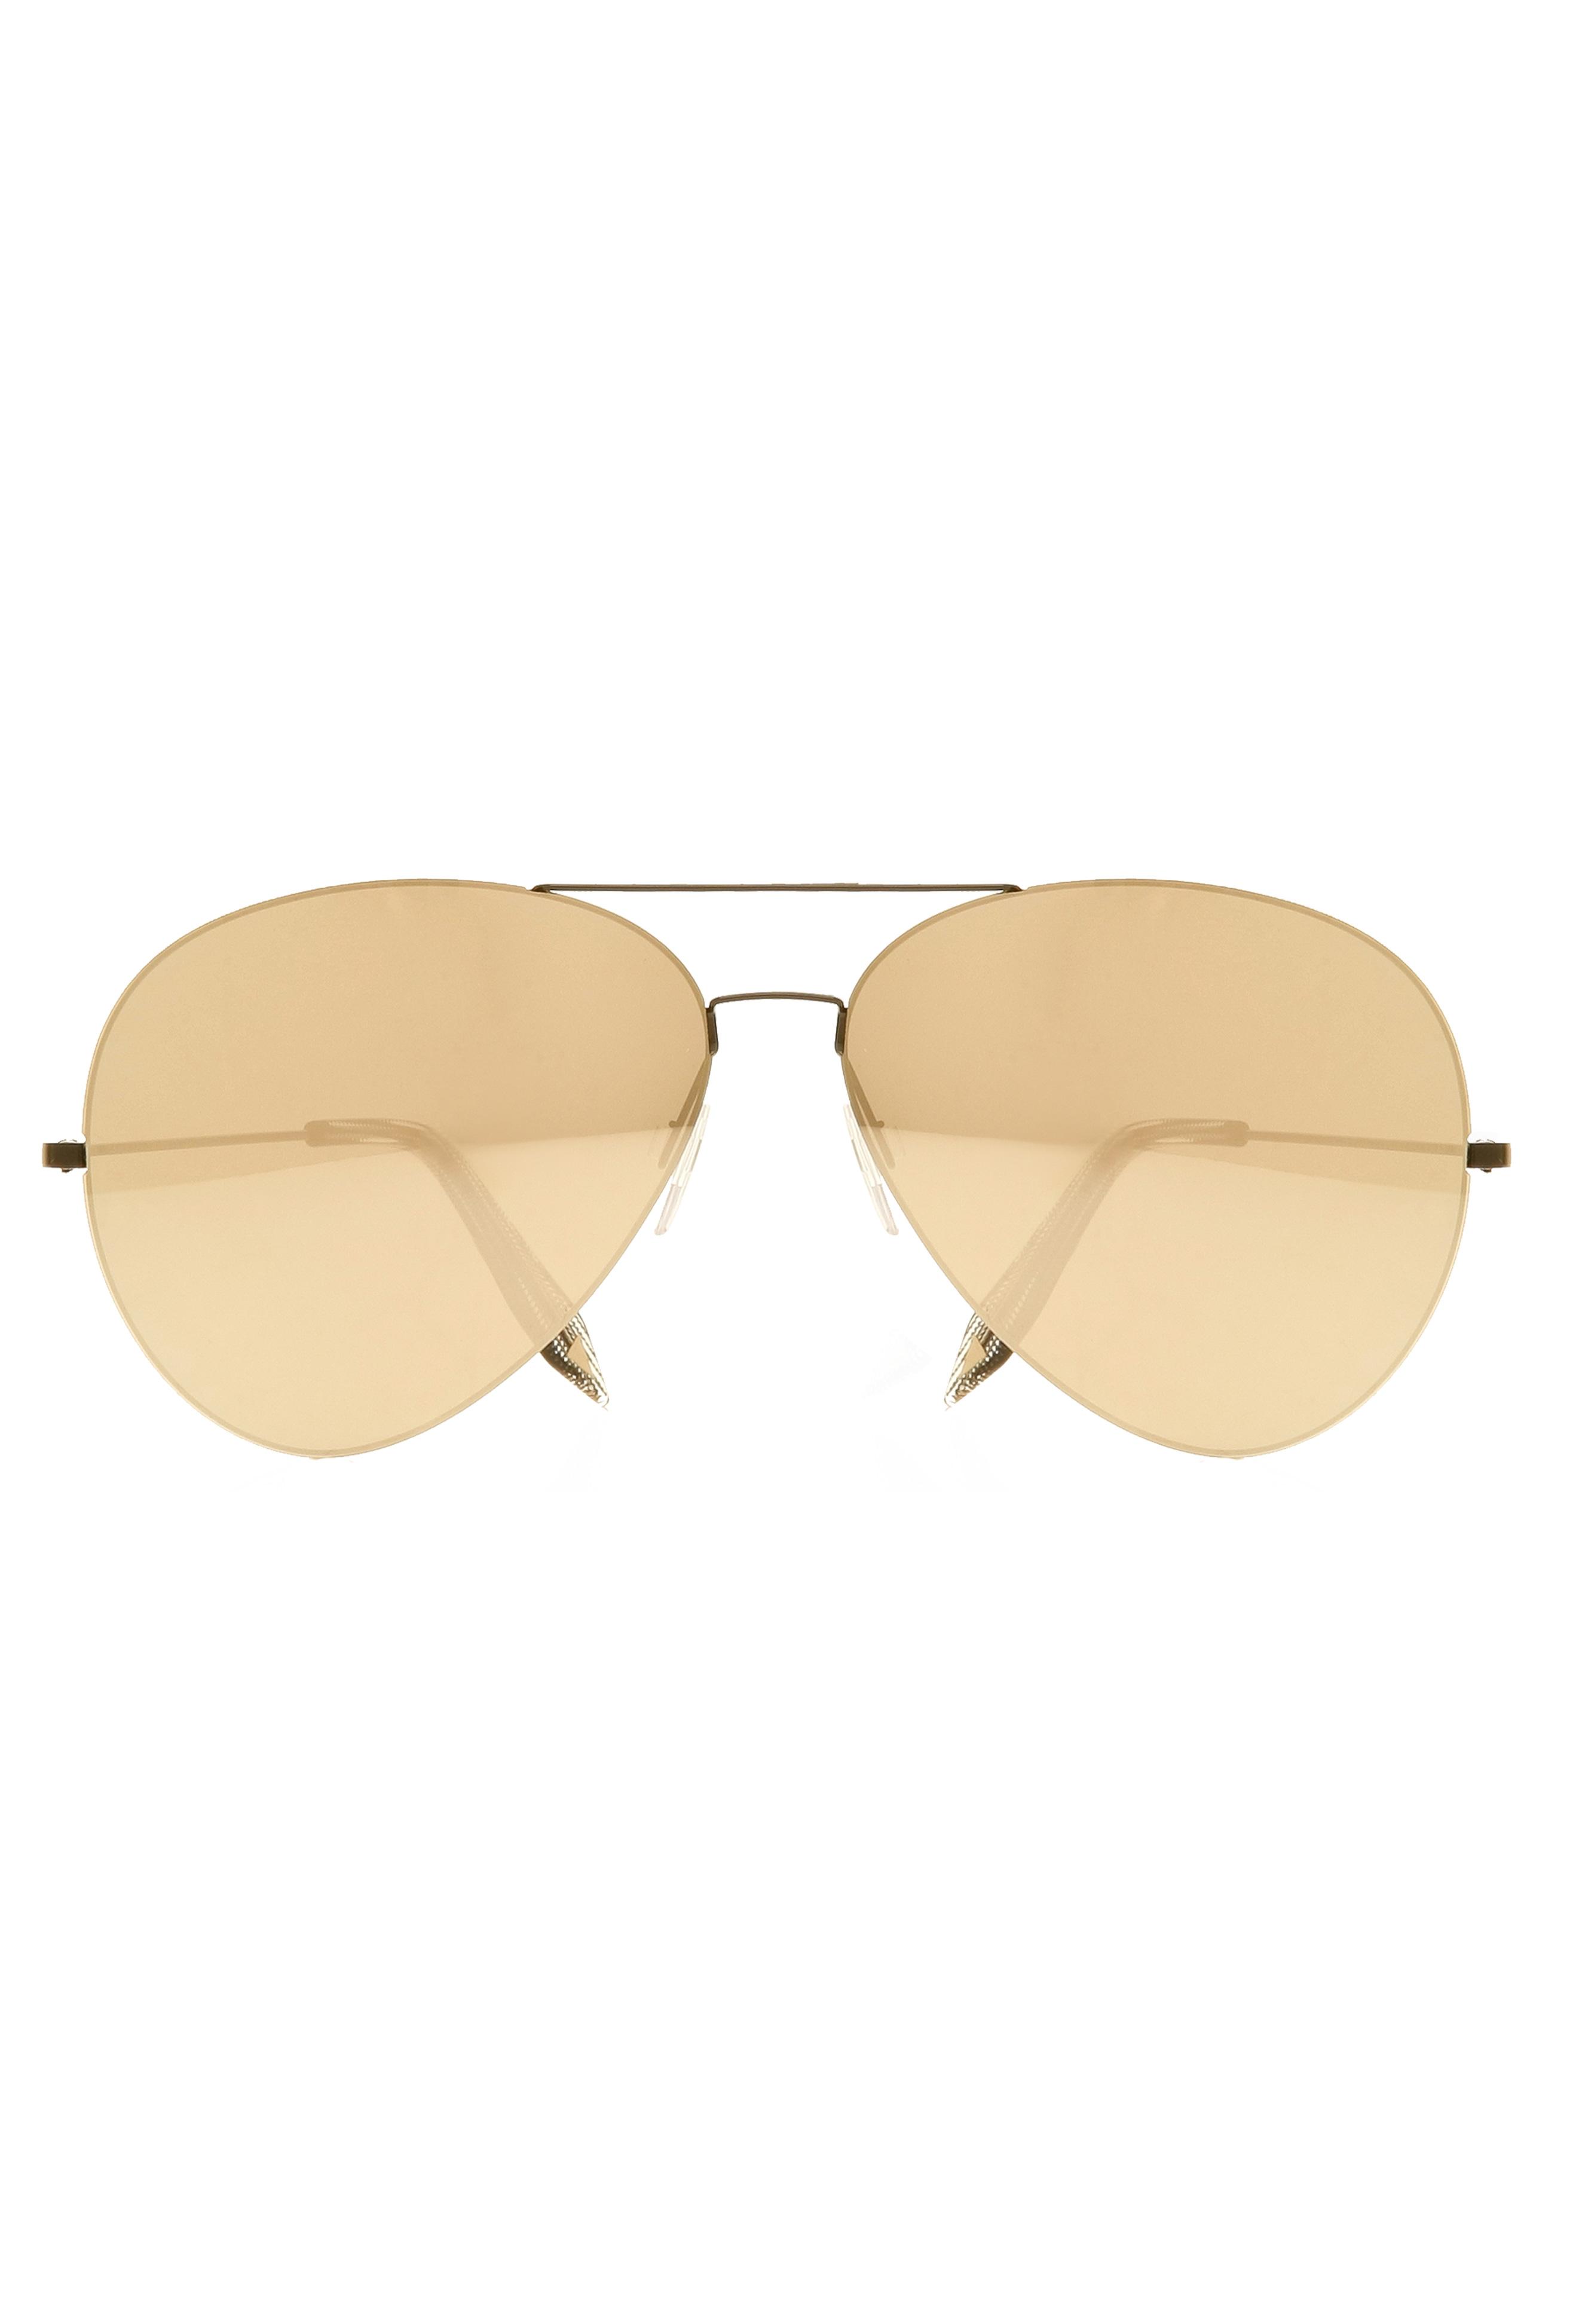 2f5f0b70a9f4 Victoria Beckham Feather Aviator Sunglasses in Metallic - Lyst